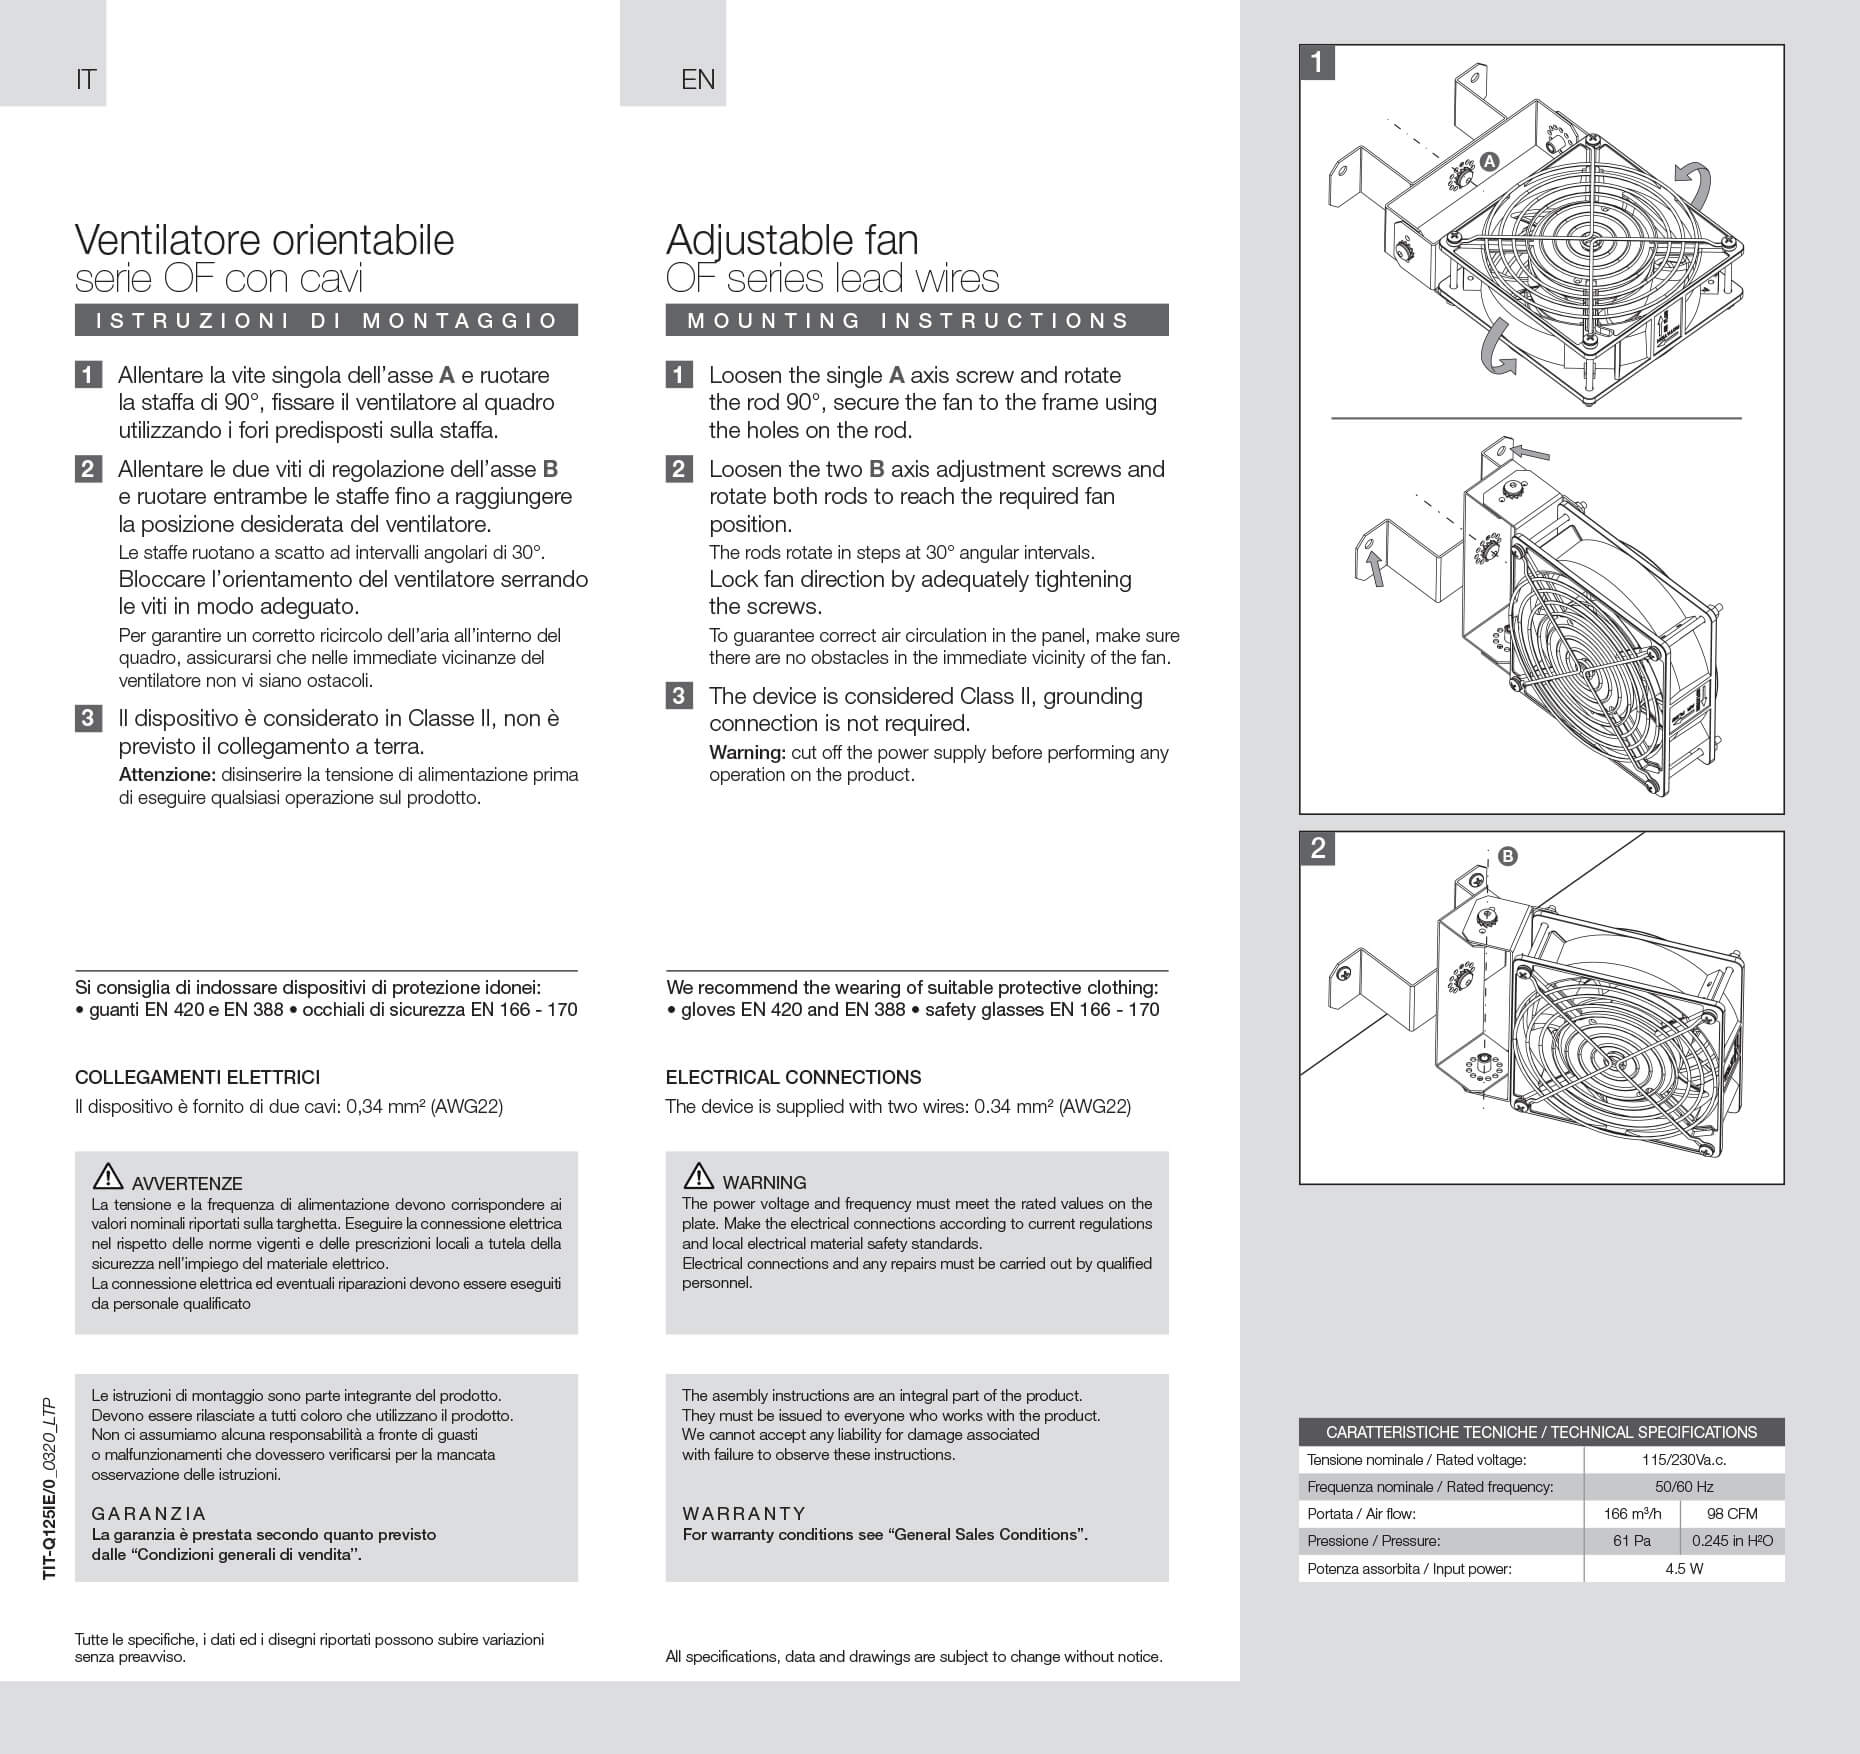 Ventilatore orientabile istruzioni